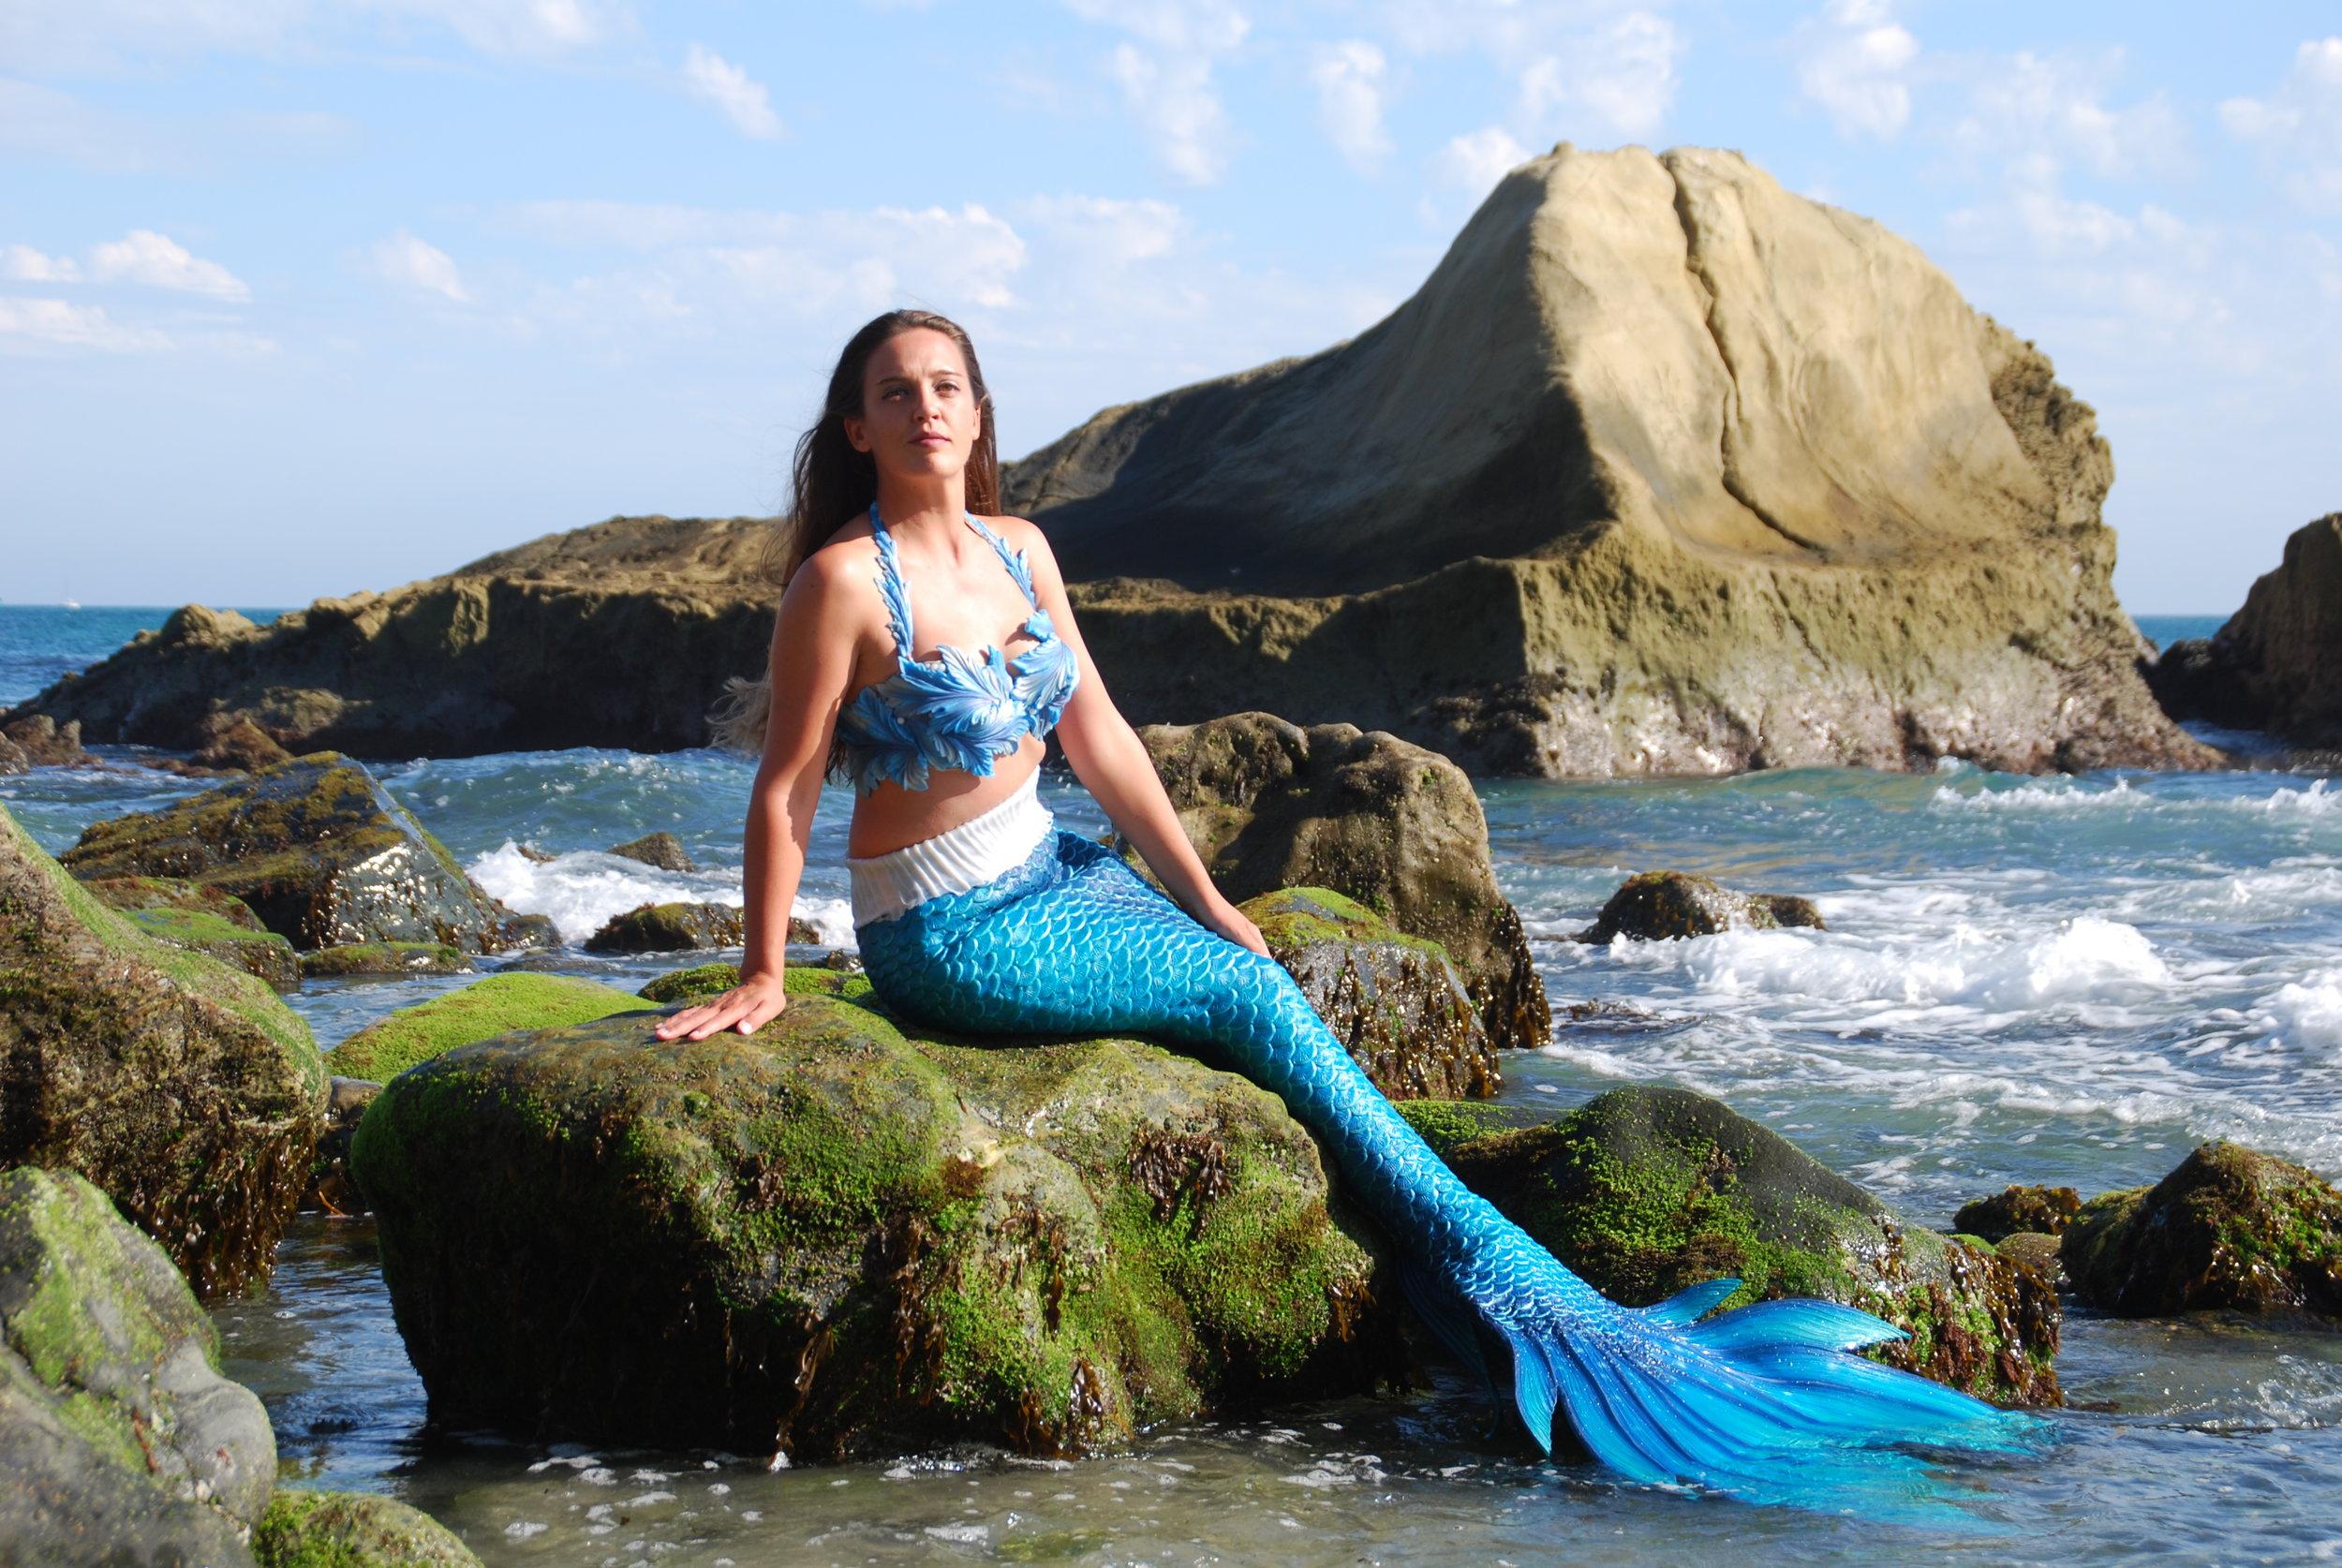 Mermaid Hilo at Beach by Carol LaMantain-Leatherman.JPG